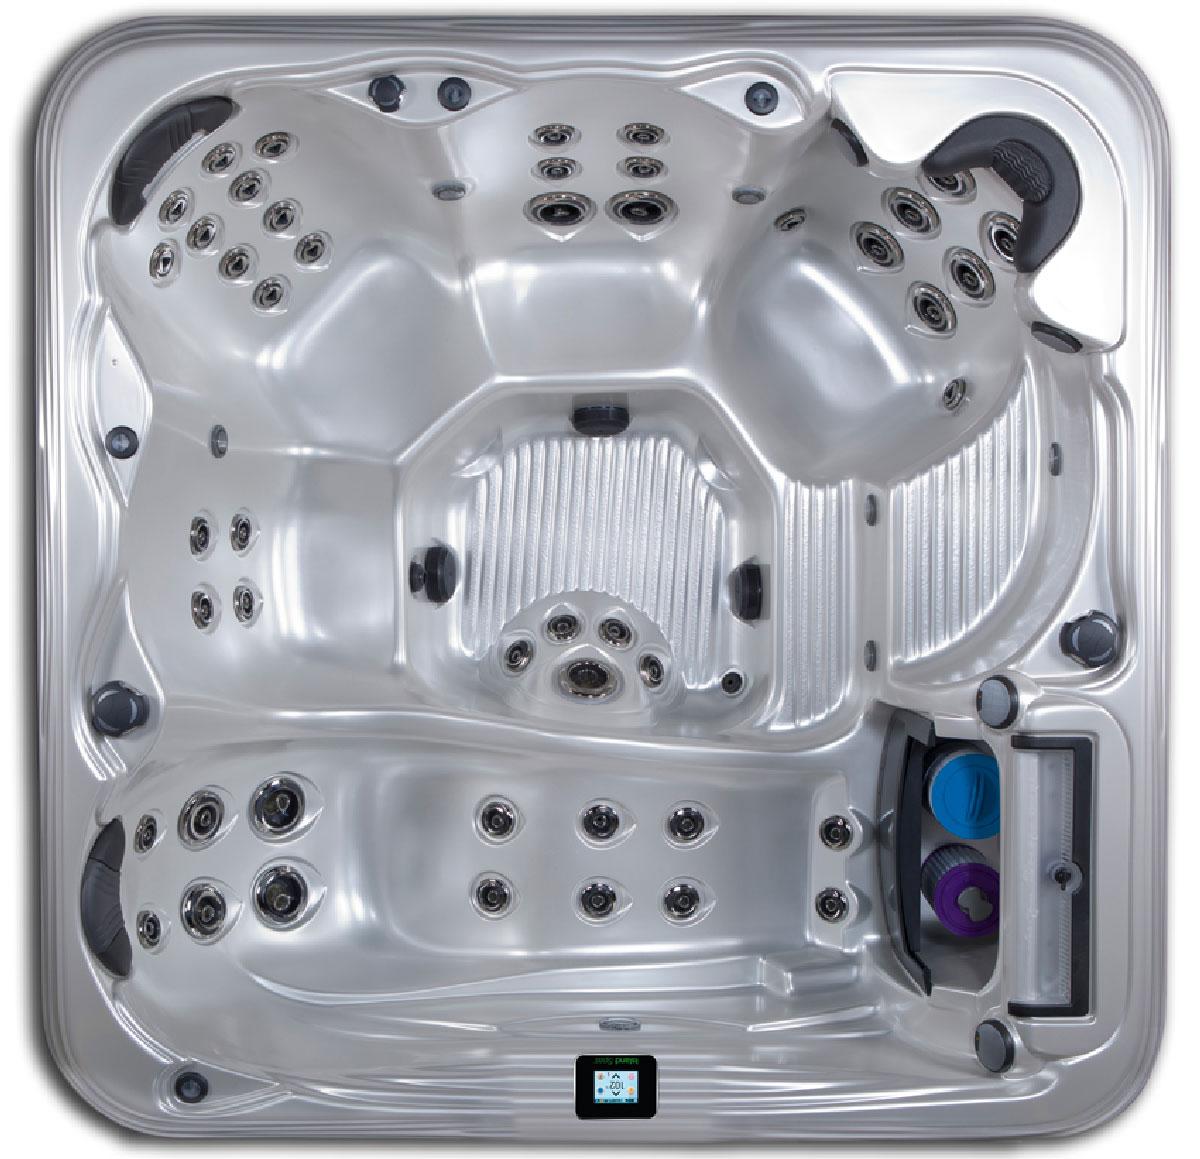 2019-Antigua-hot-tub-spas-artesian-charlotte-nc-dealer-pool-spa.jpg